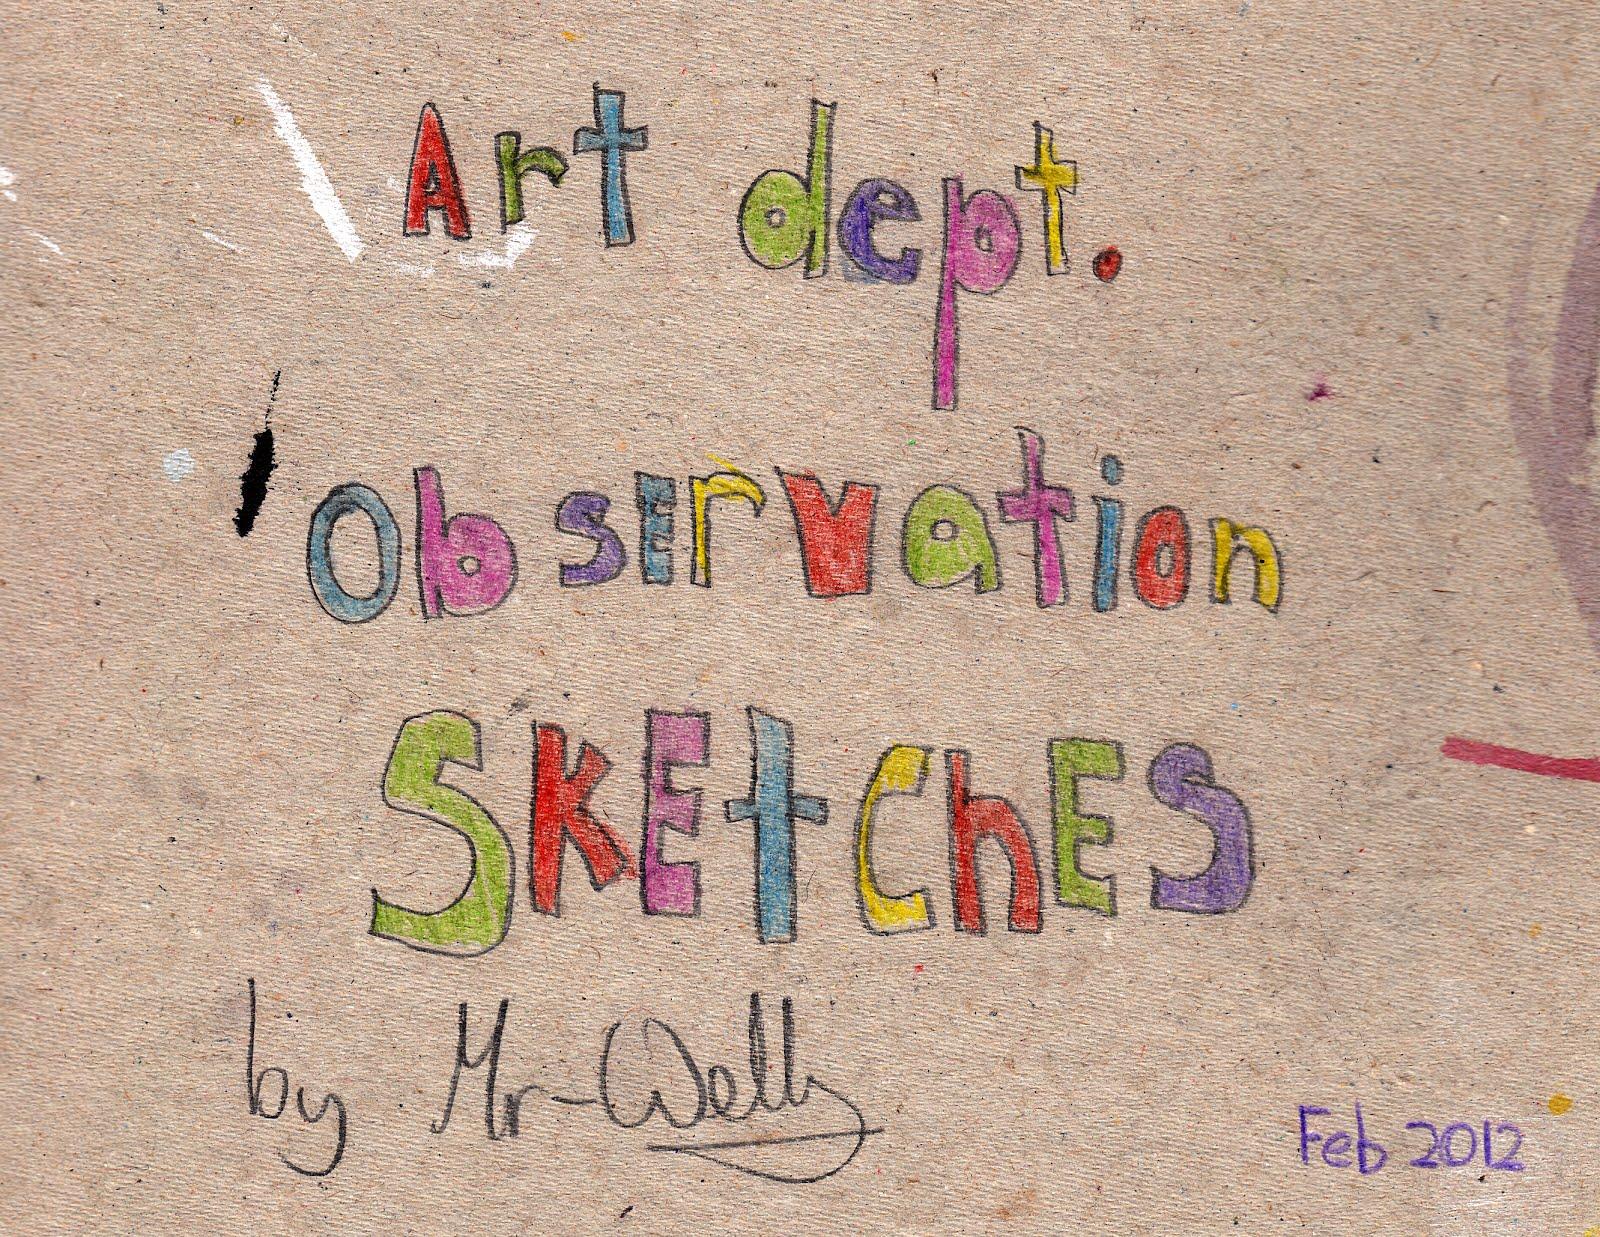 mr wells sketches